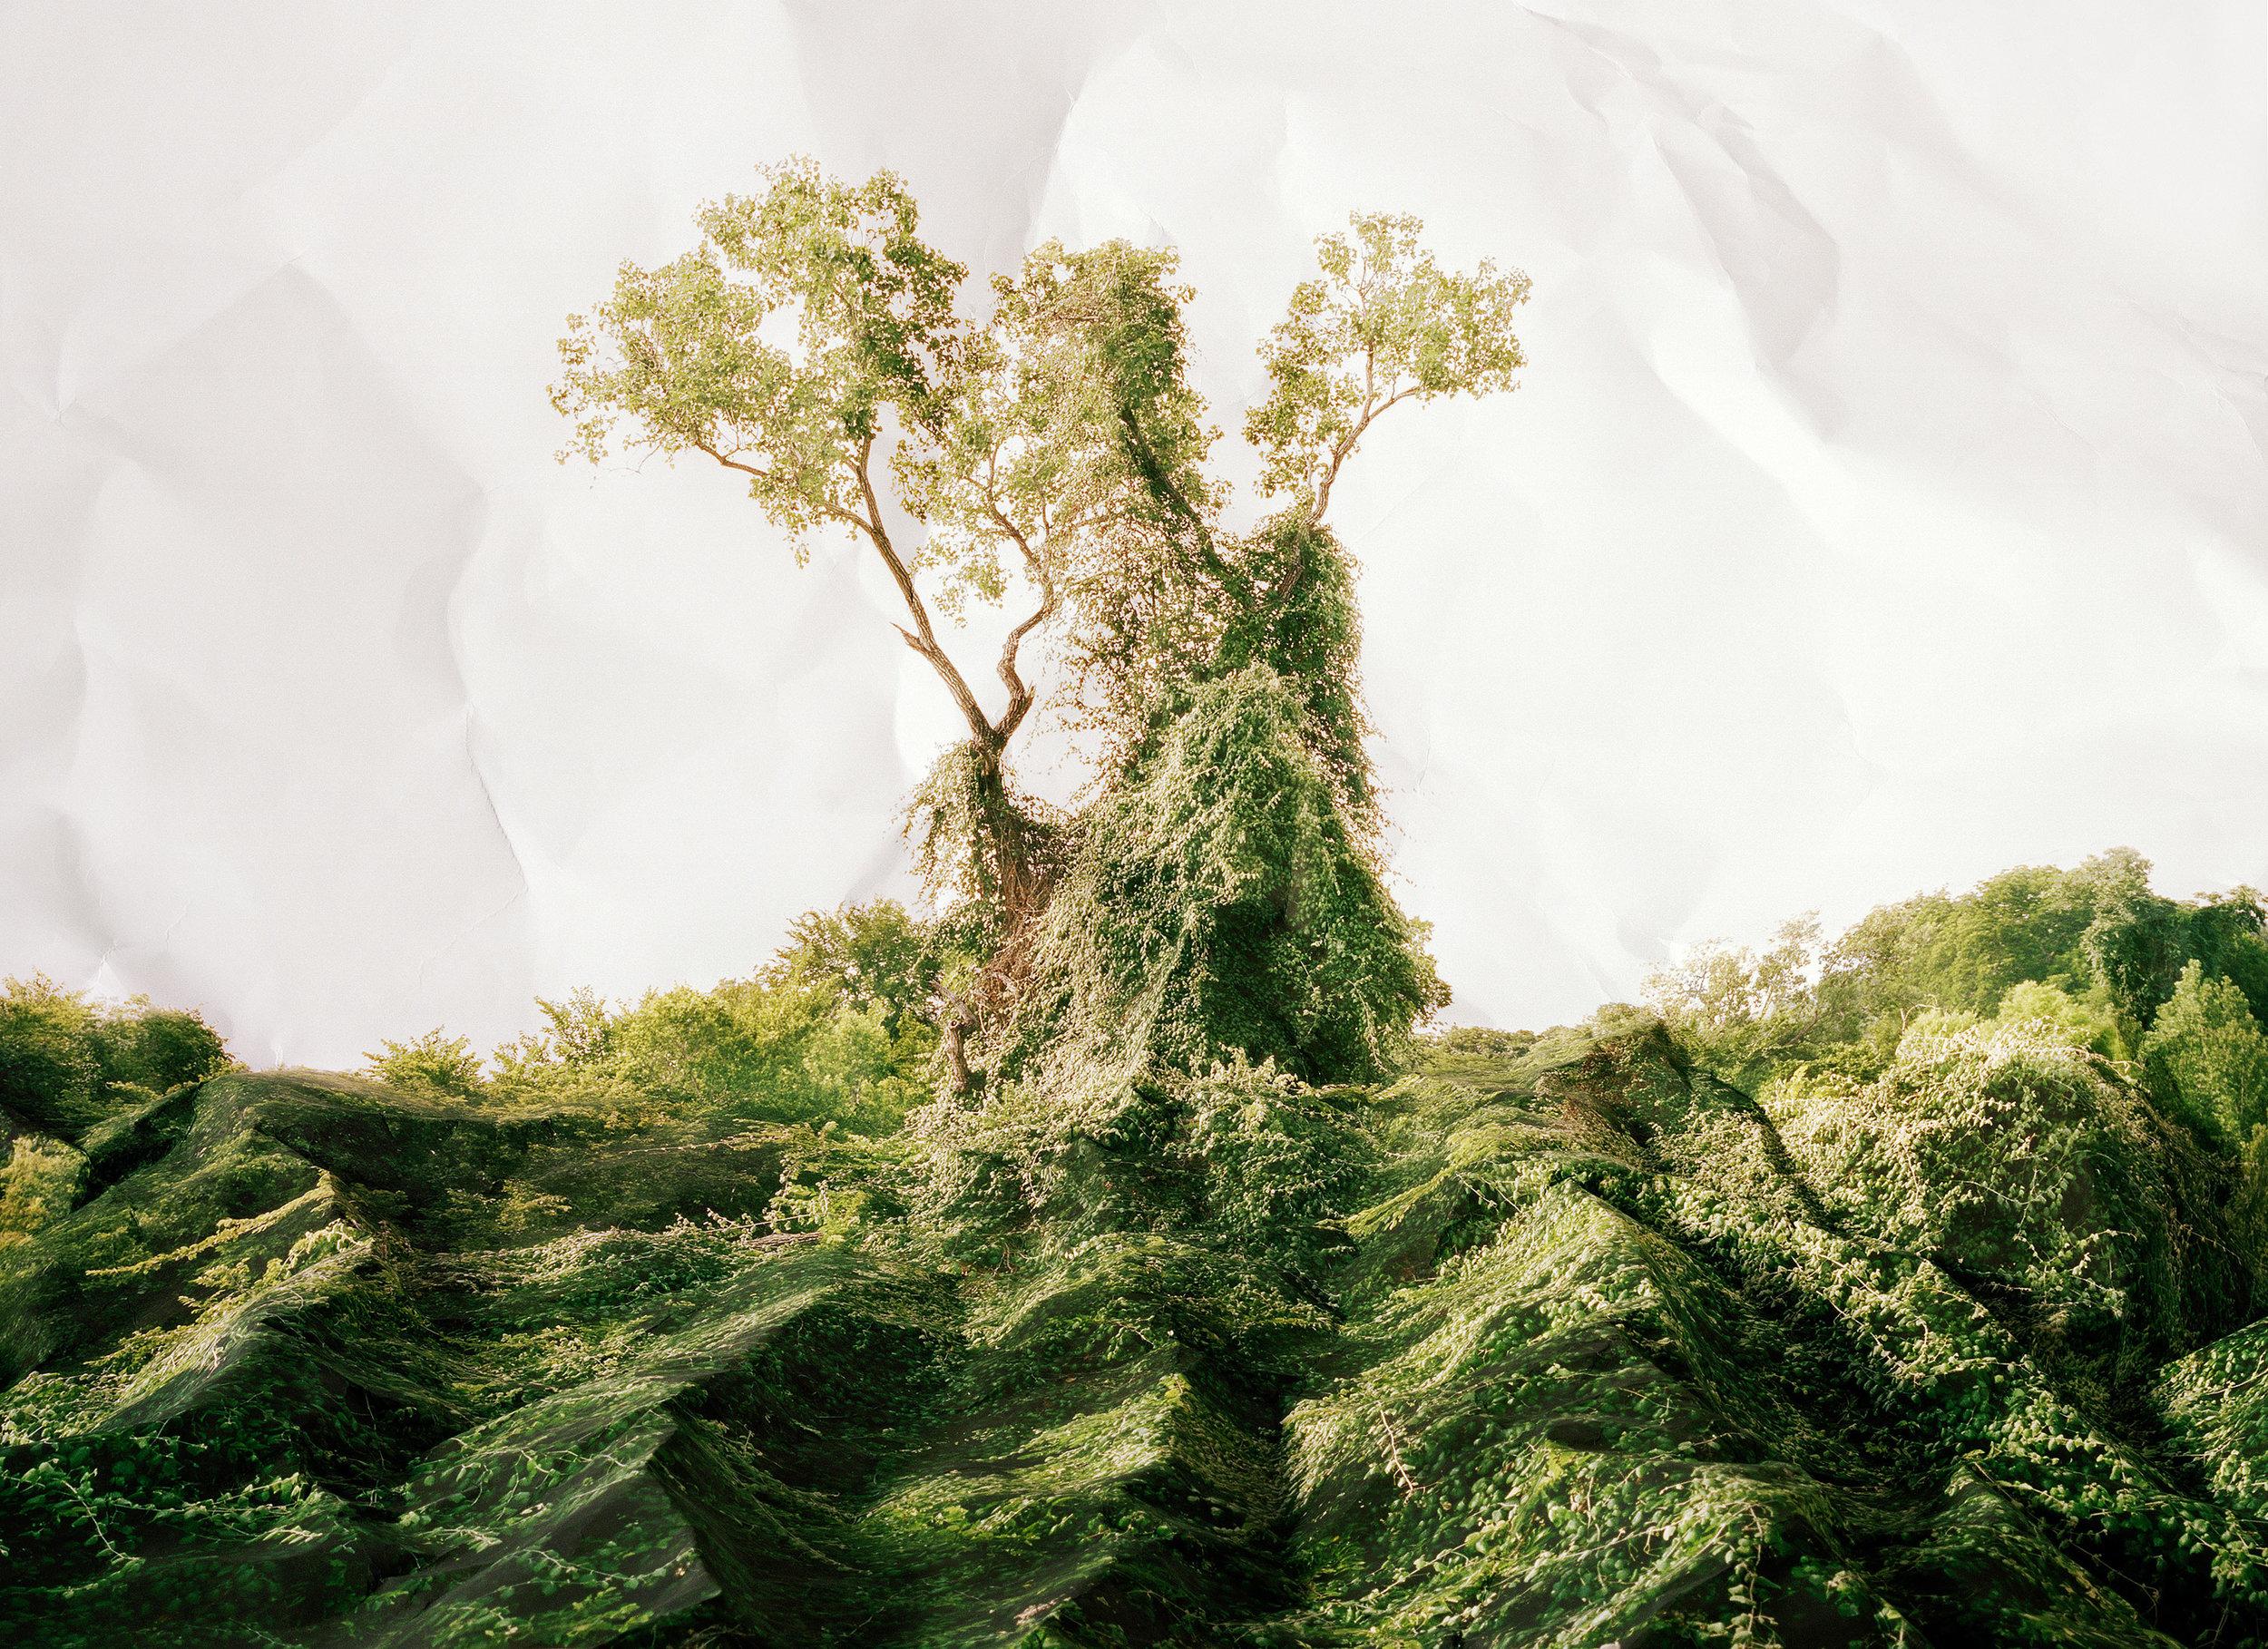 Laura Plageman,  Response to Kudzu, Texas , 2011  Digital pigment print, 30 x 40 in, edition of 4   Inquire